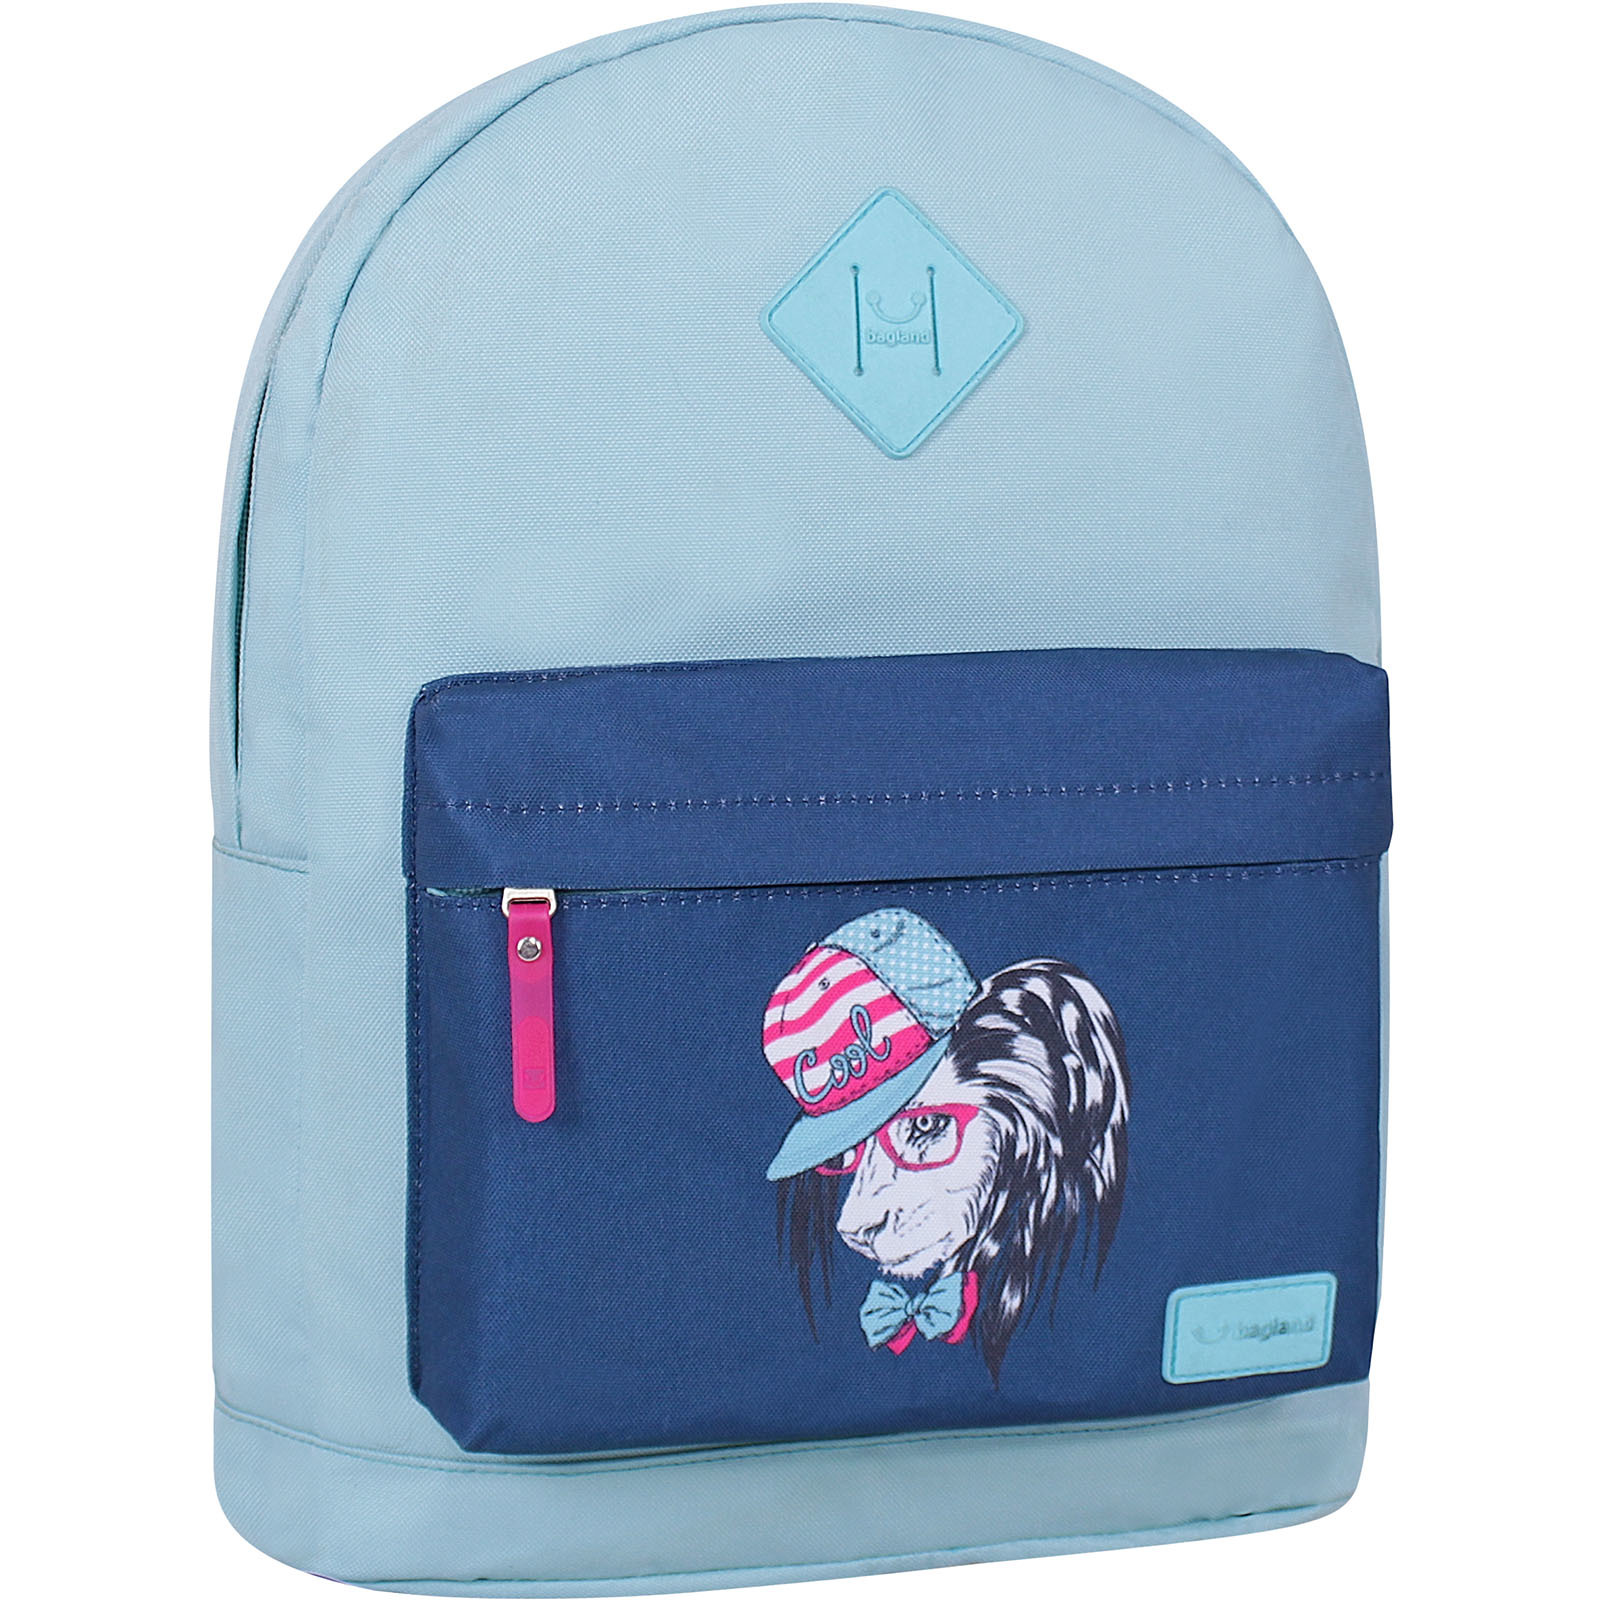 Городские рюкзаки Рюкзак Bagland Молодежный W/R 17 л. тиффани 180 (00533662) IMG_9500_суб.180_.JPG